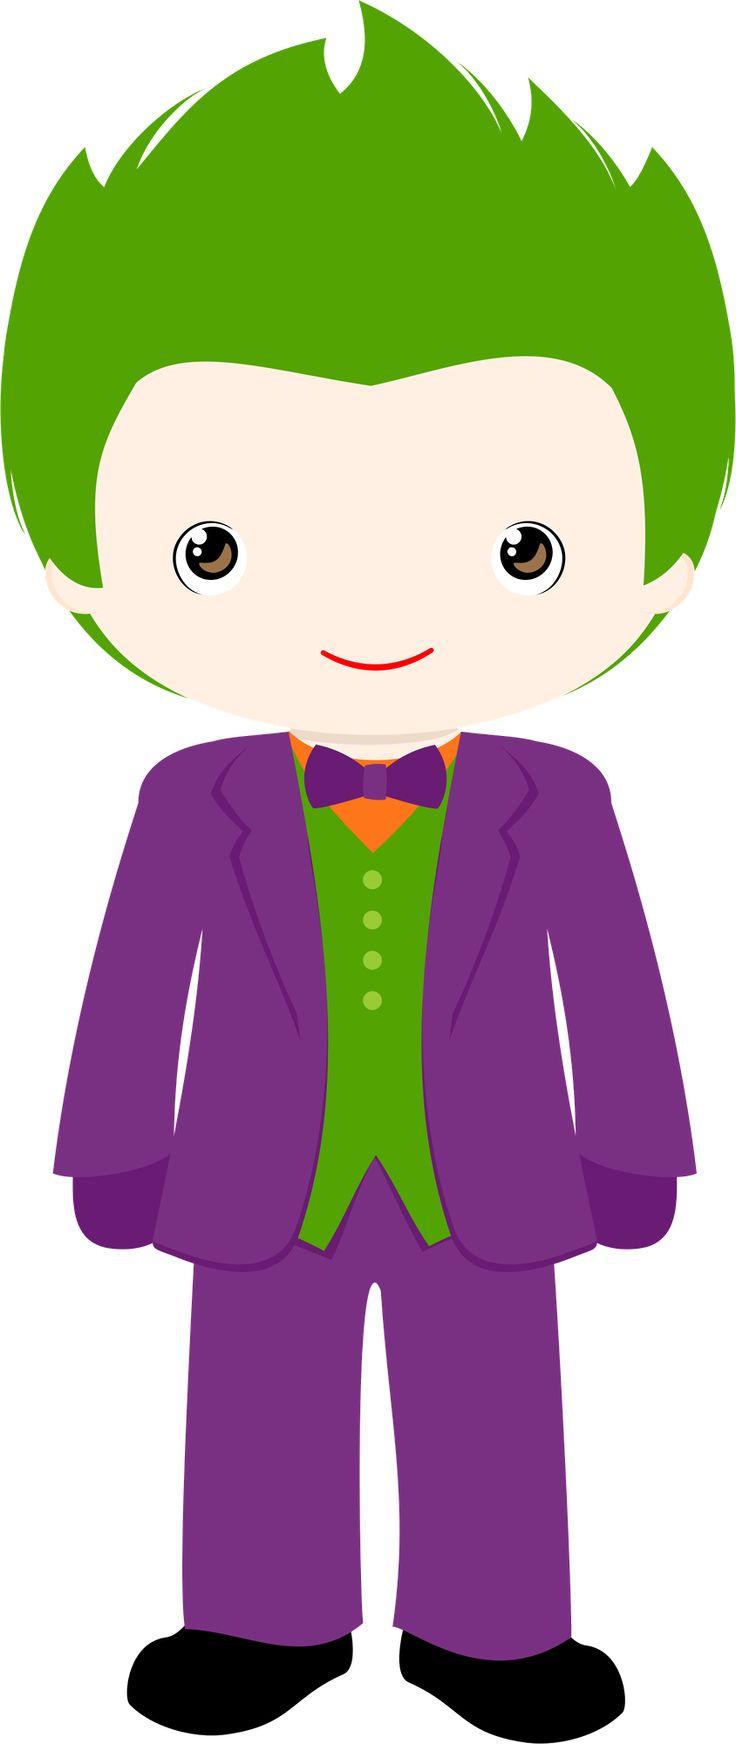 Joker clipart #13